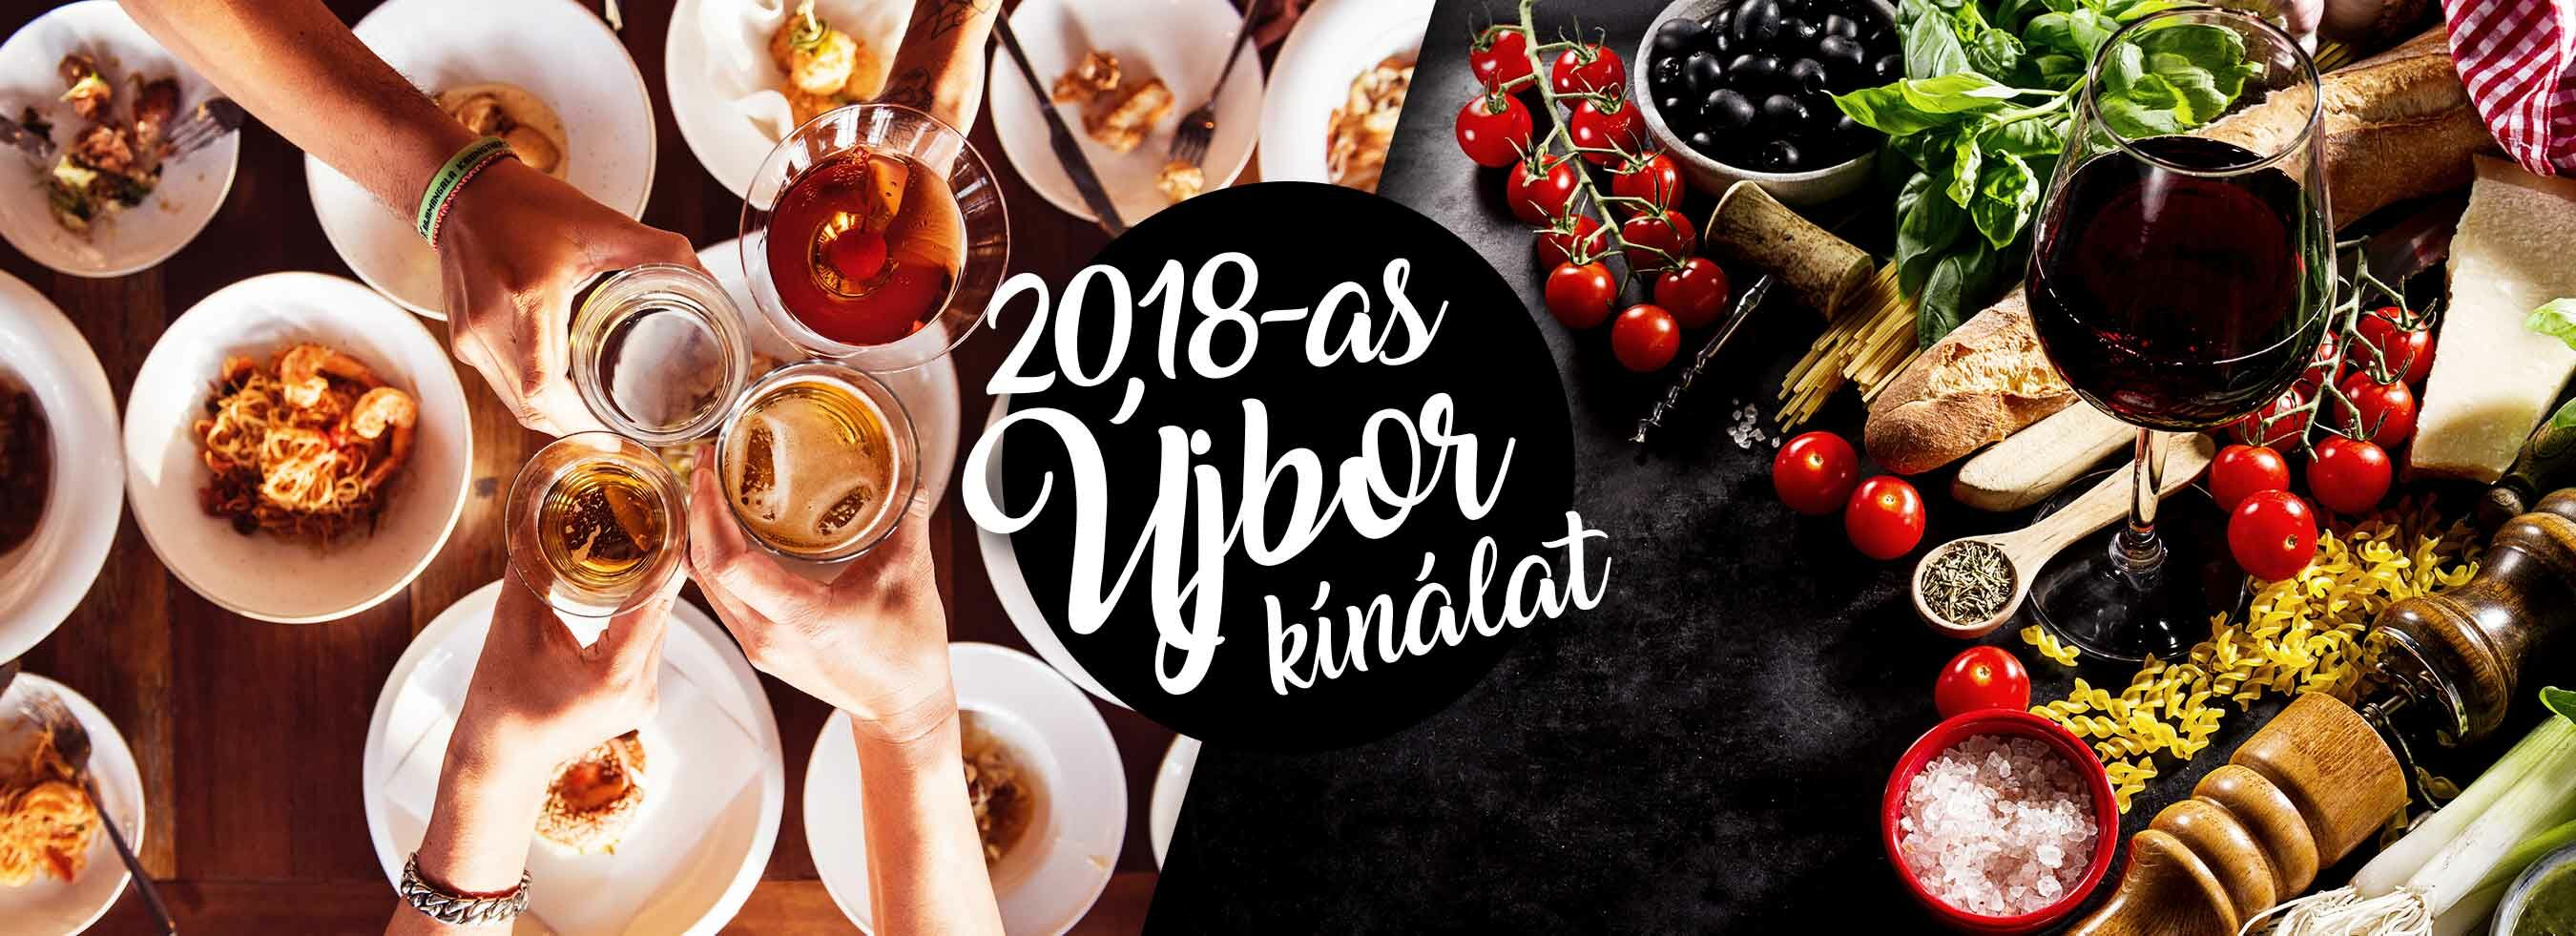 Újborok 2018